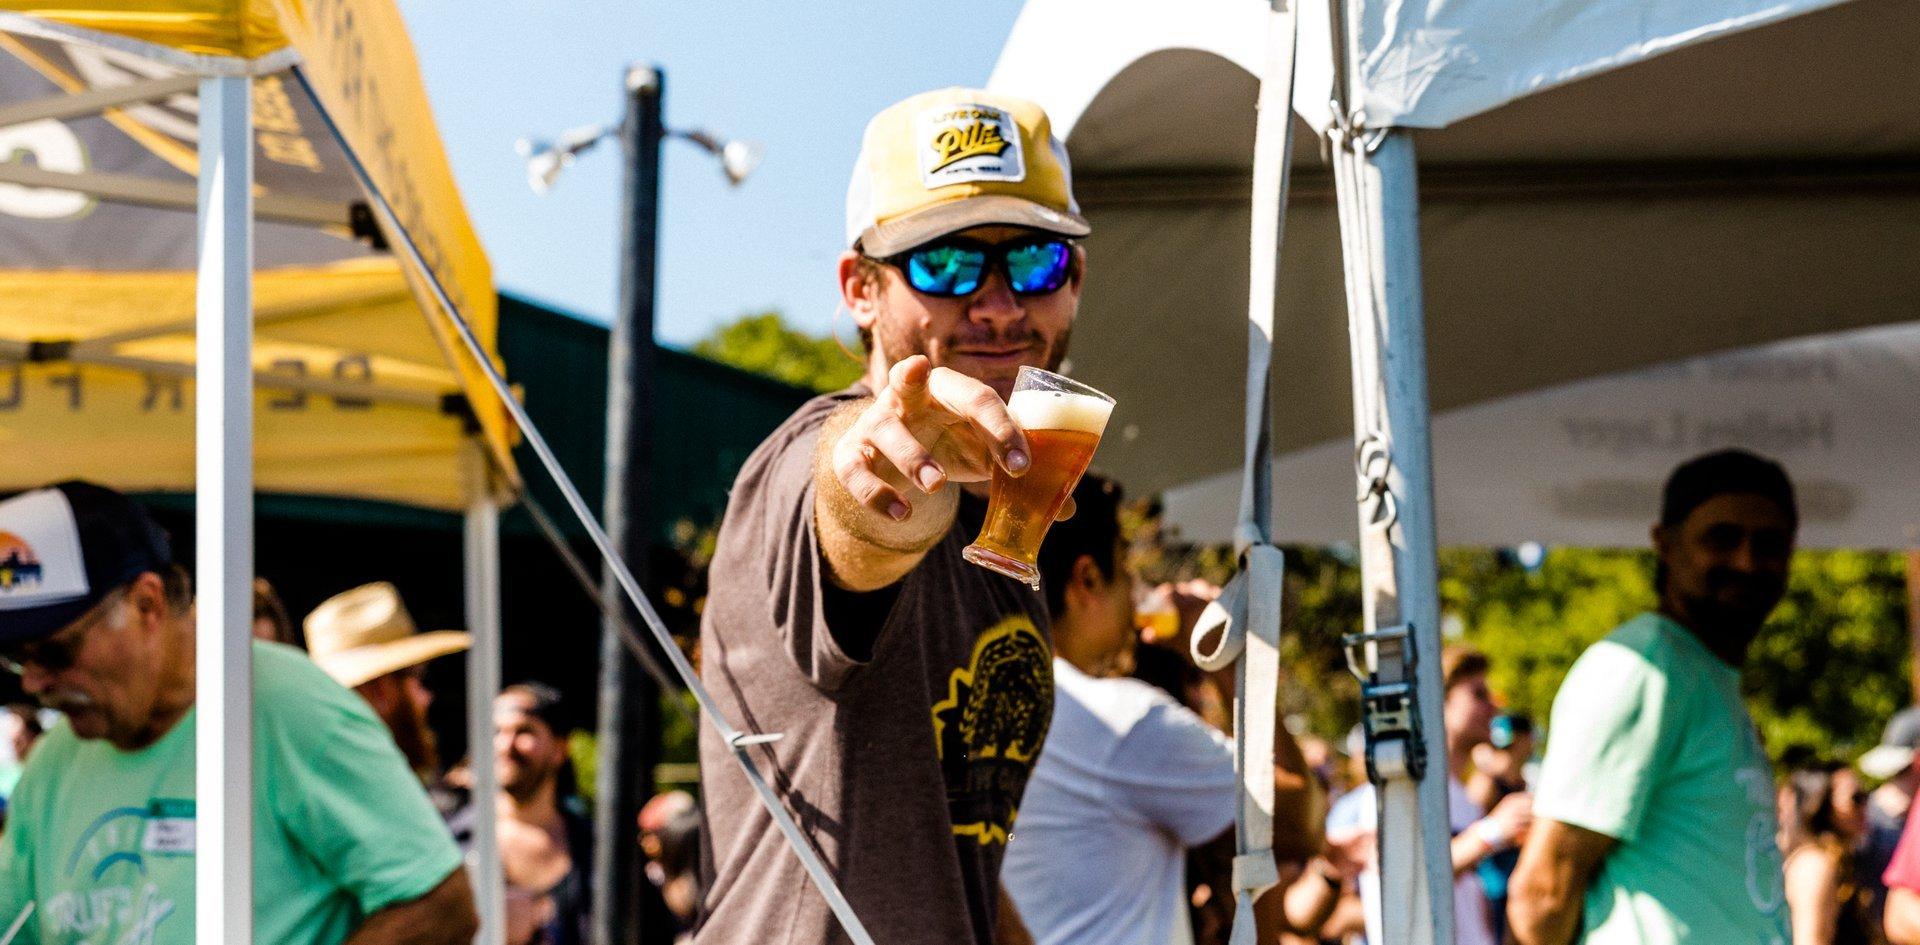 Texas Craft Brewers Festival in Texas - Best Season 2019